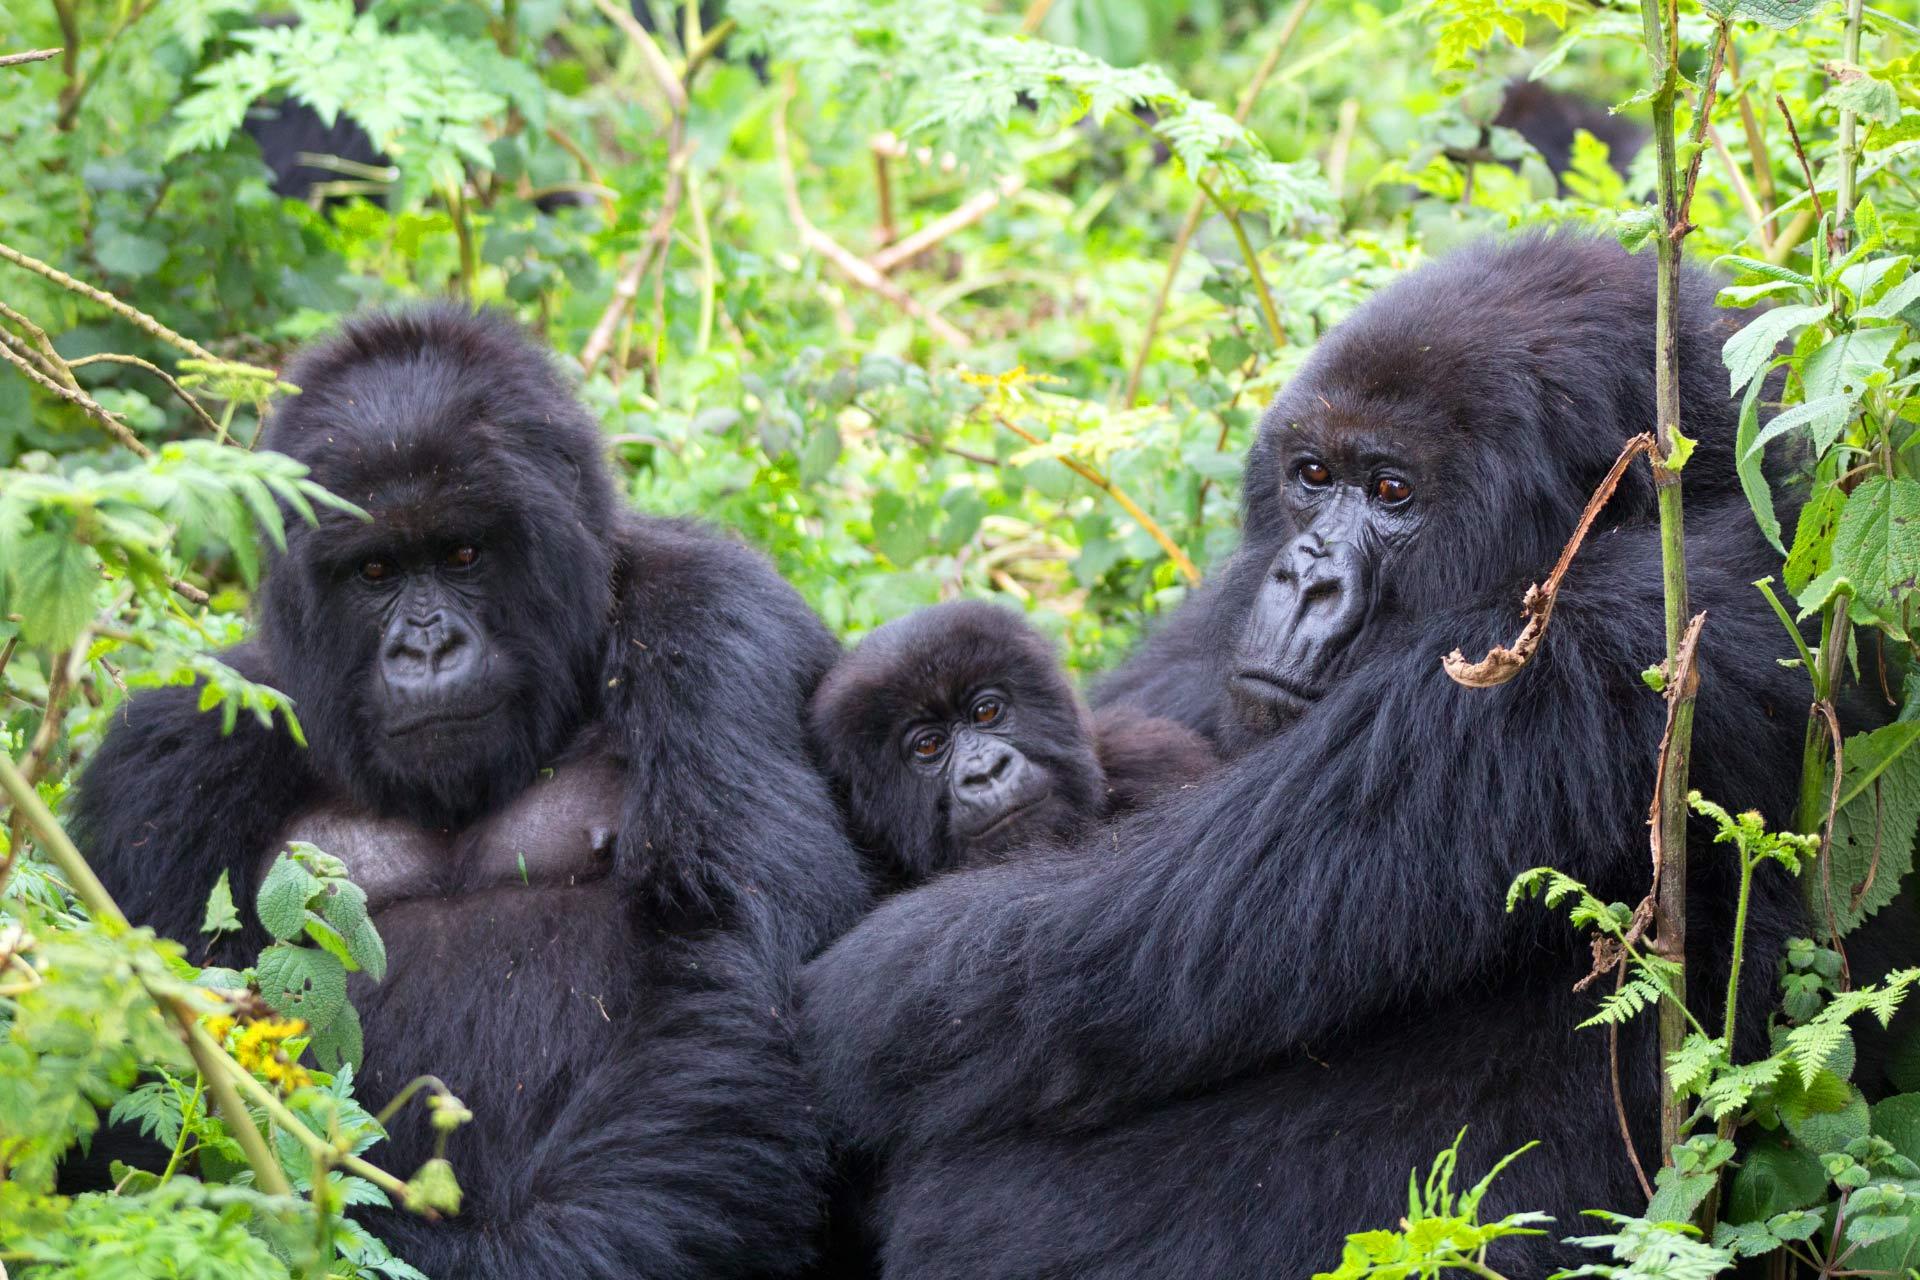 5 Days Ziwa Rhino trekking and Murchison falls park Safari and Bwindi Gorillas